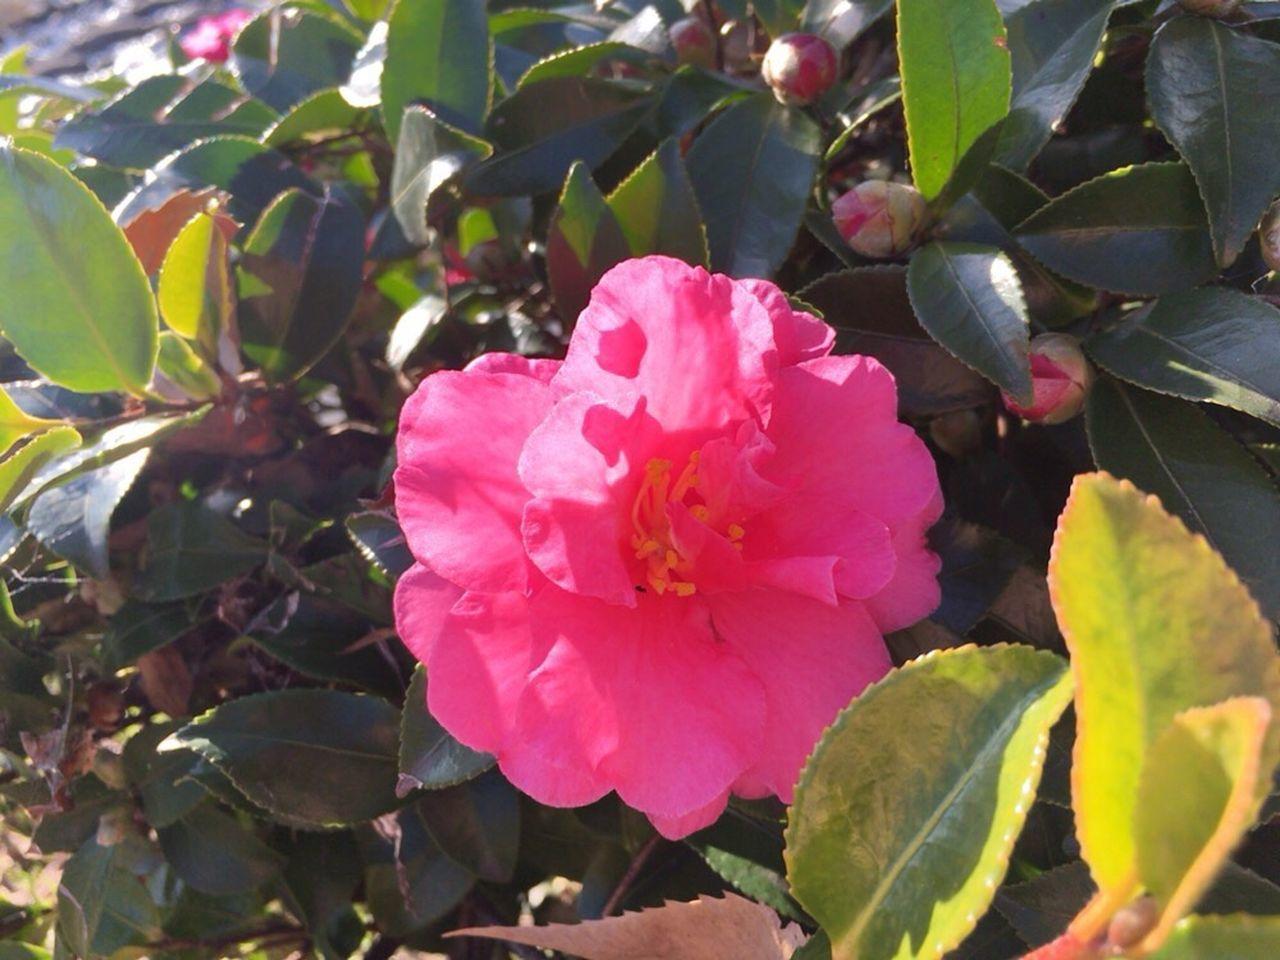 Kyoto,japan Kyoto City Camellia Sasanqua